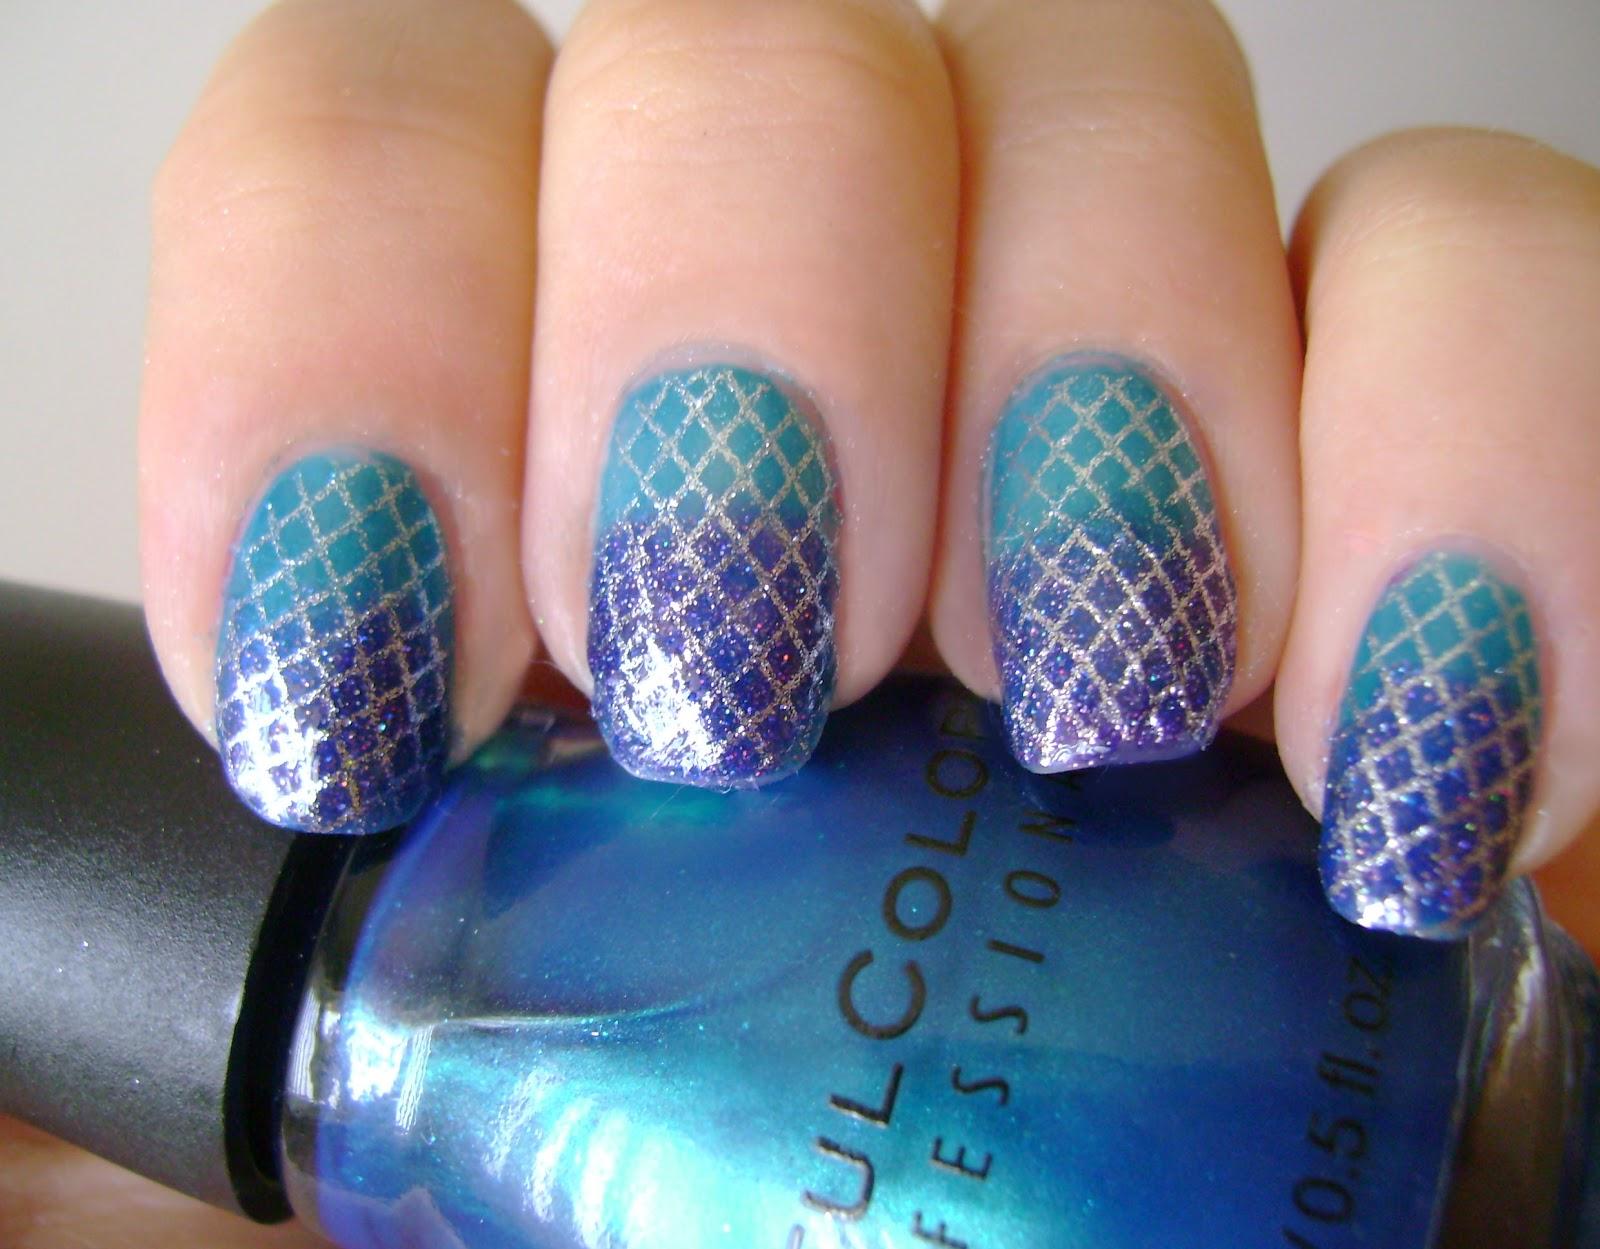 acrylic nail art designs: Mermaid nail art